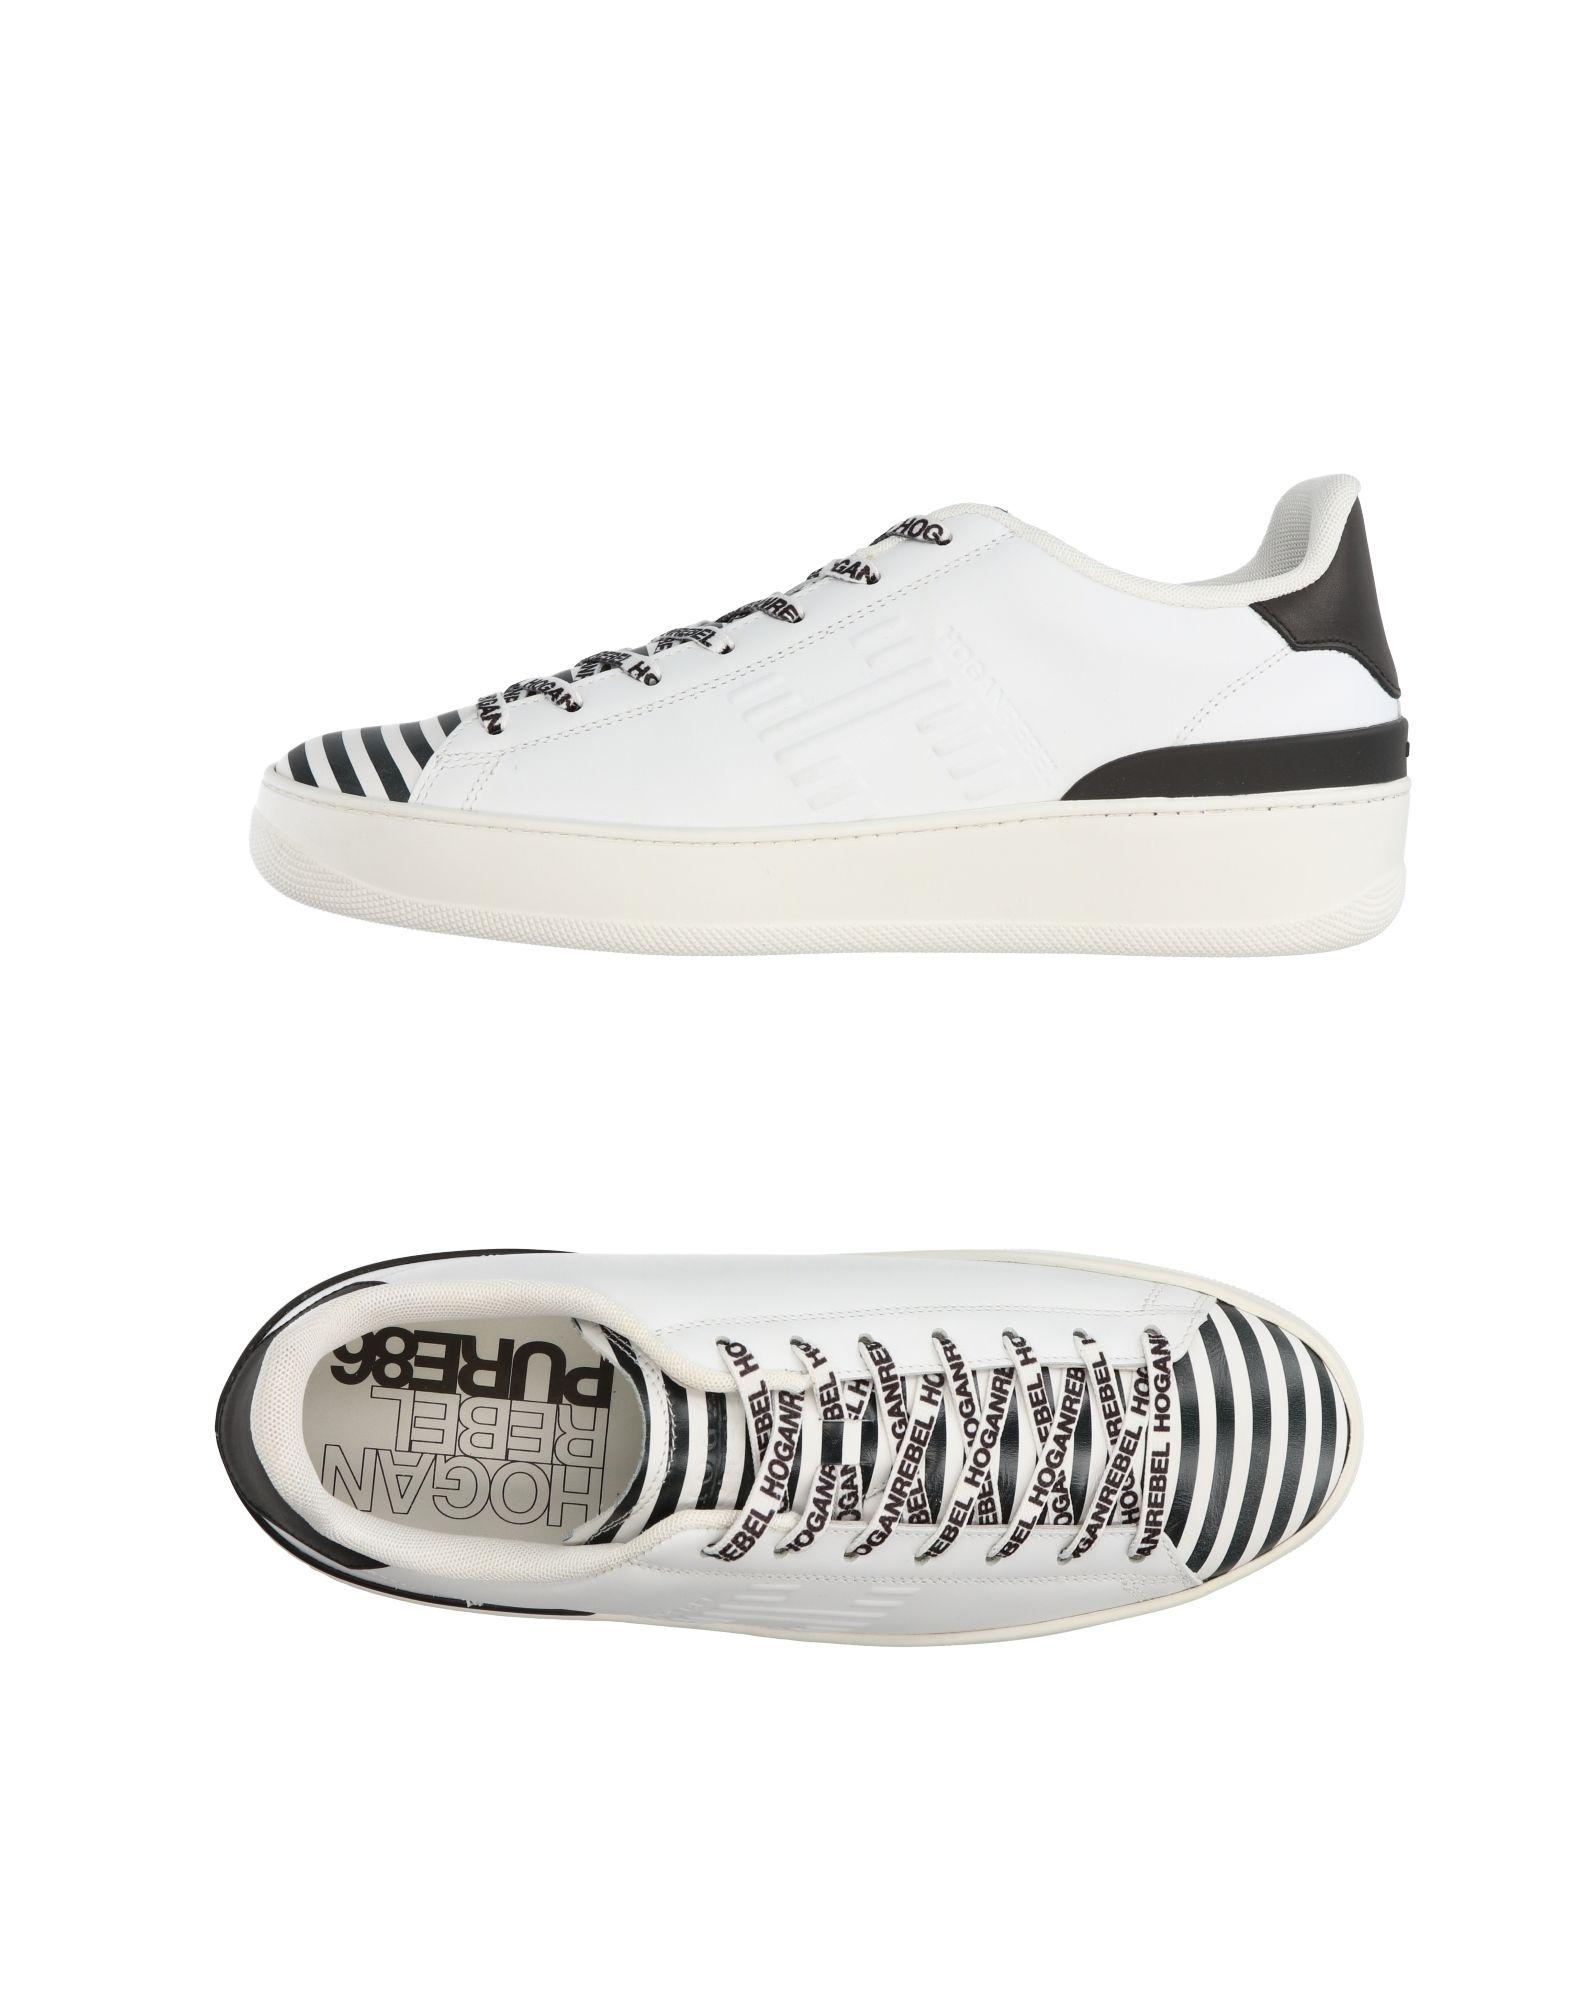 Hogan Rebel Sneakers Herren  11298378BB Gute Qualität beliebte Schuhe